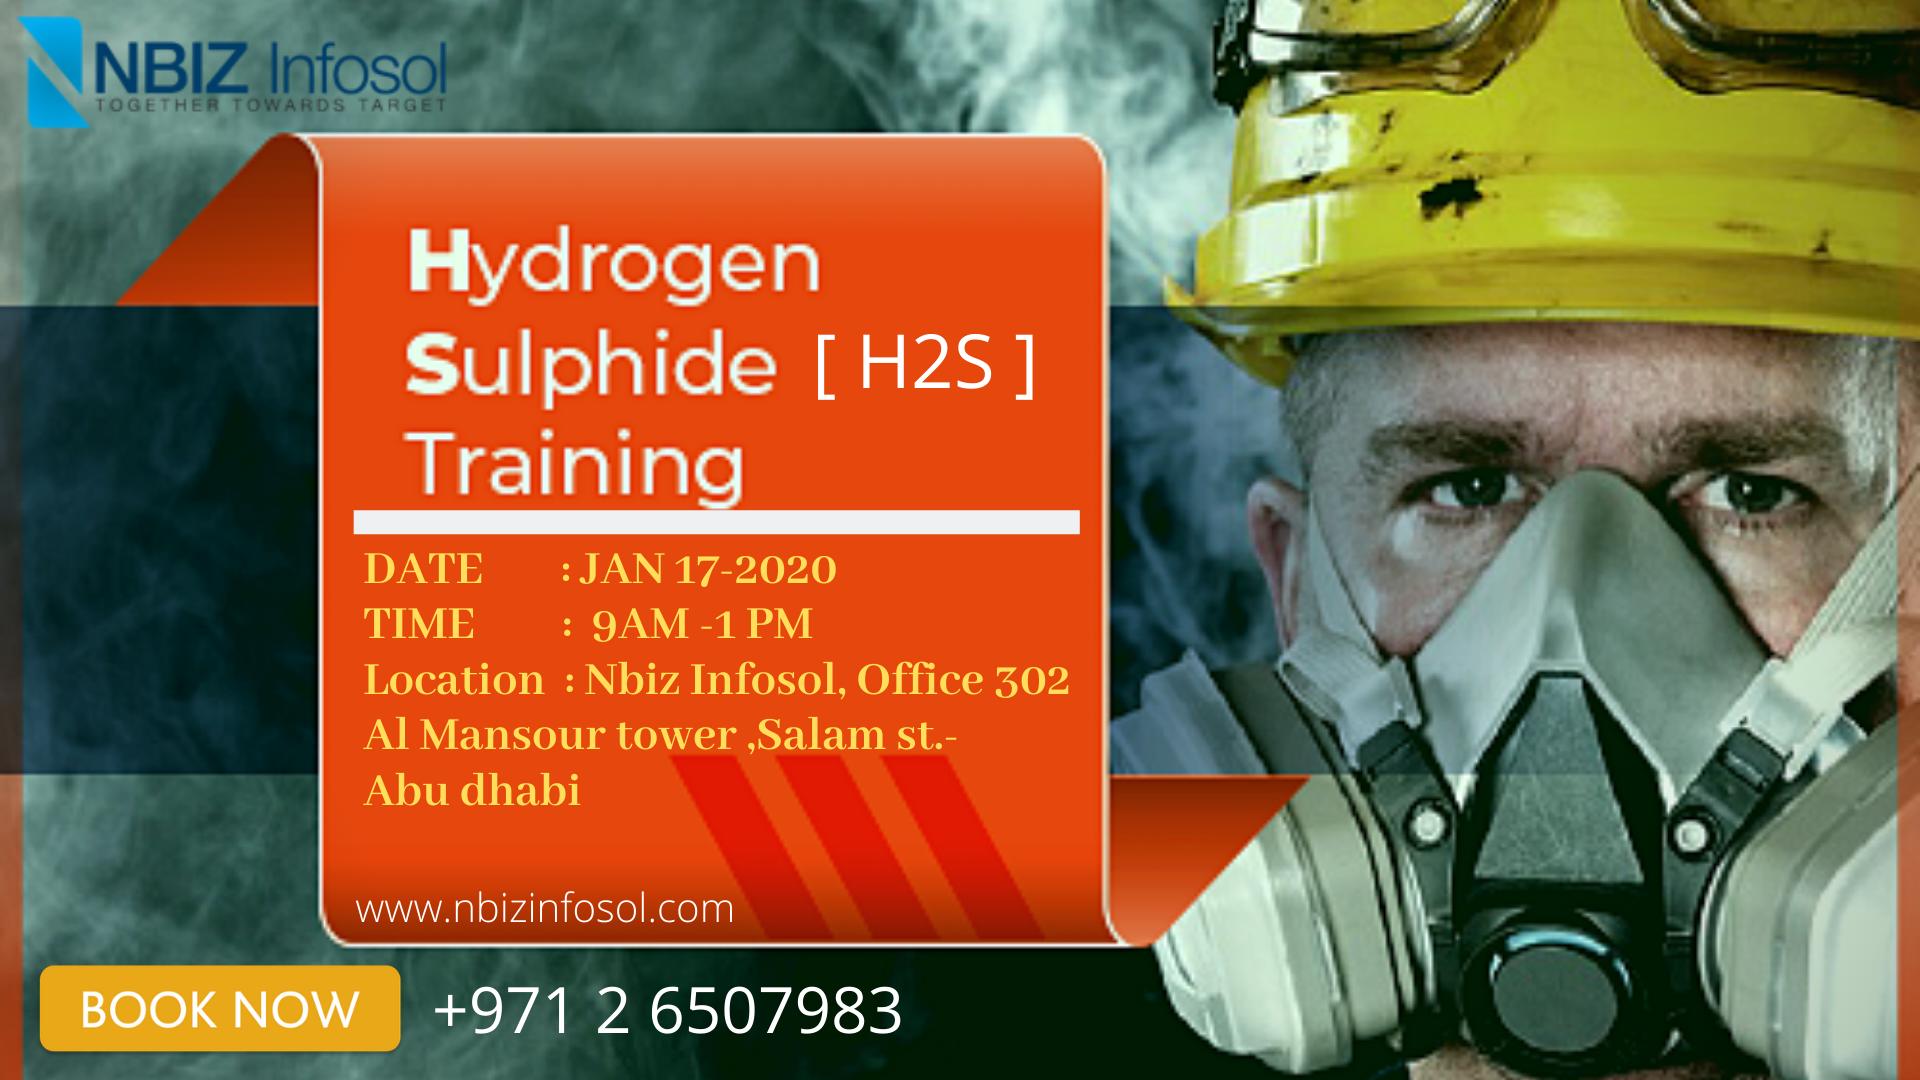 hydrogensulphidetraining H2S Healthandsafety